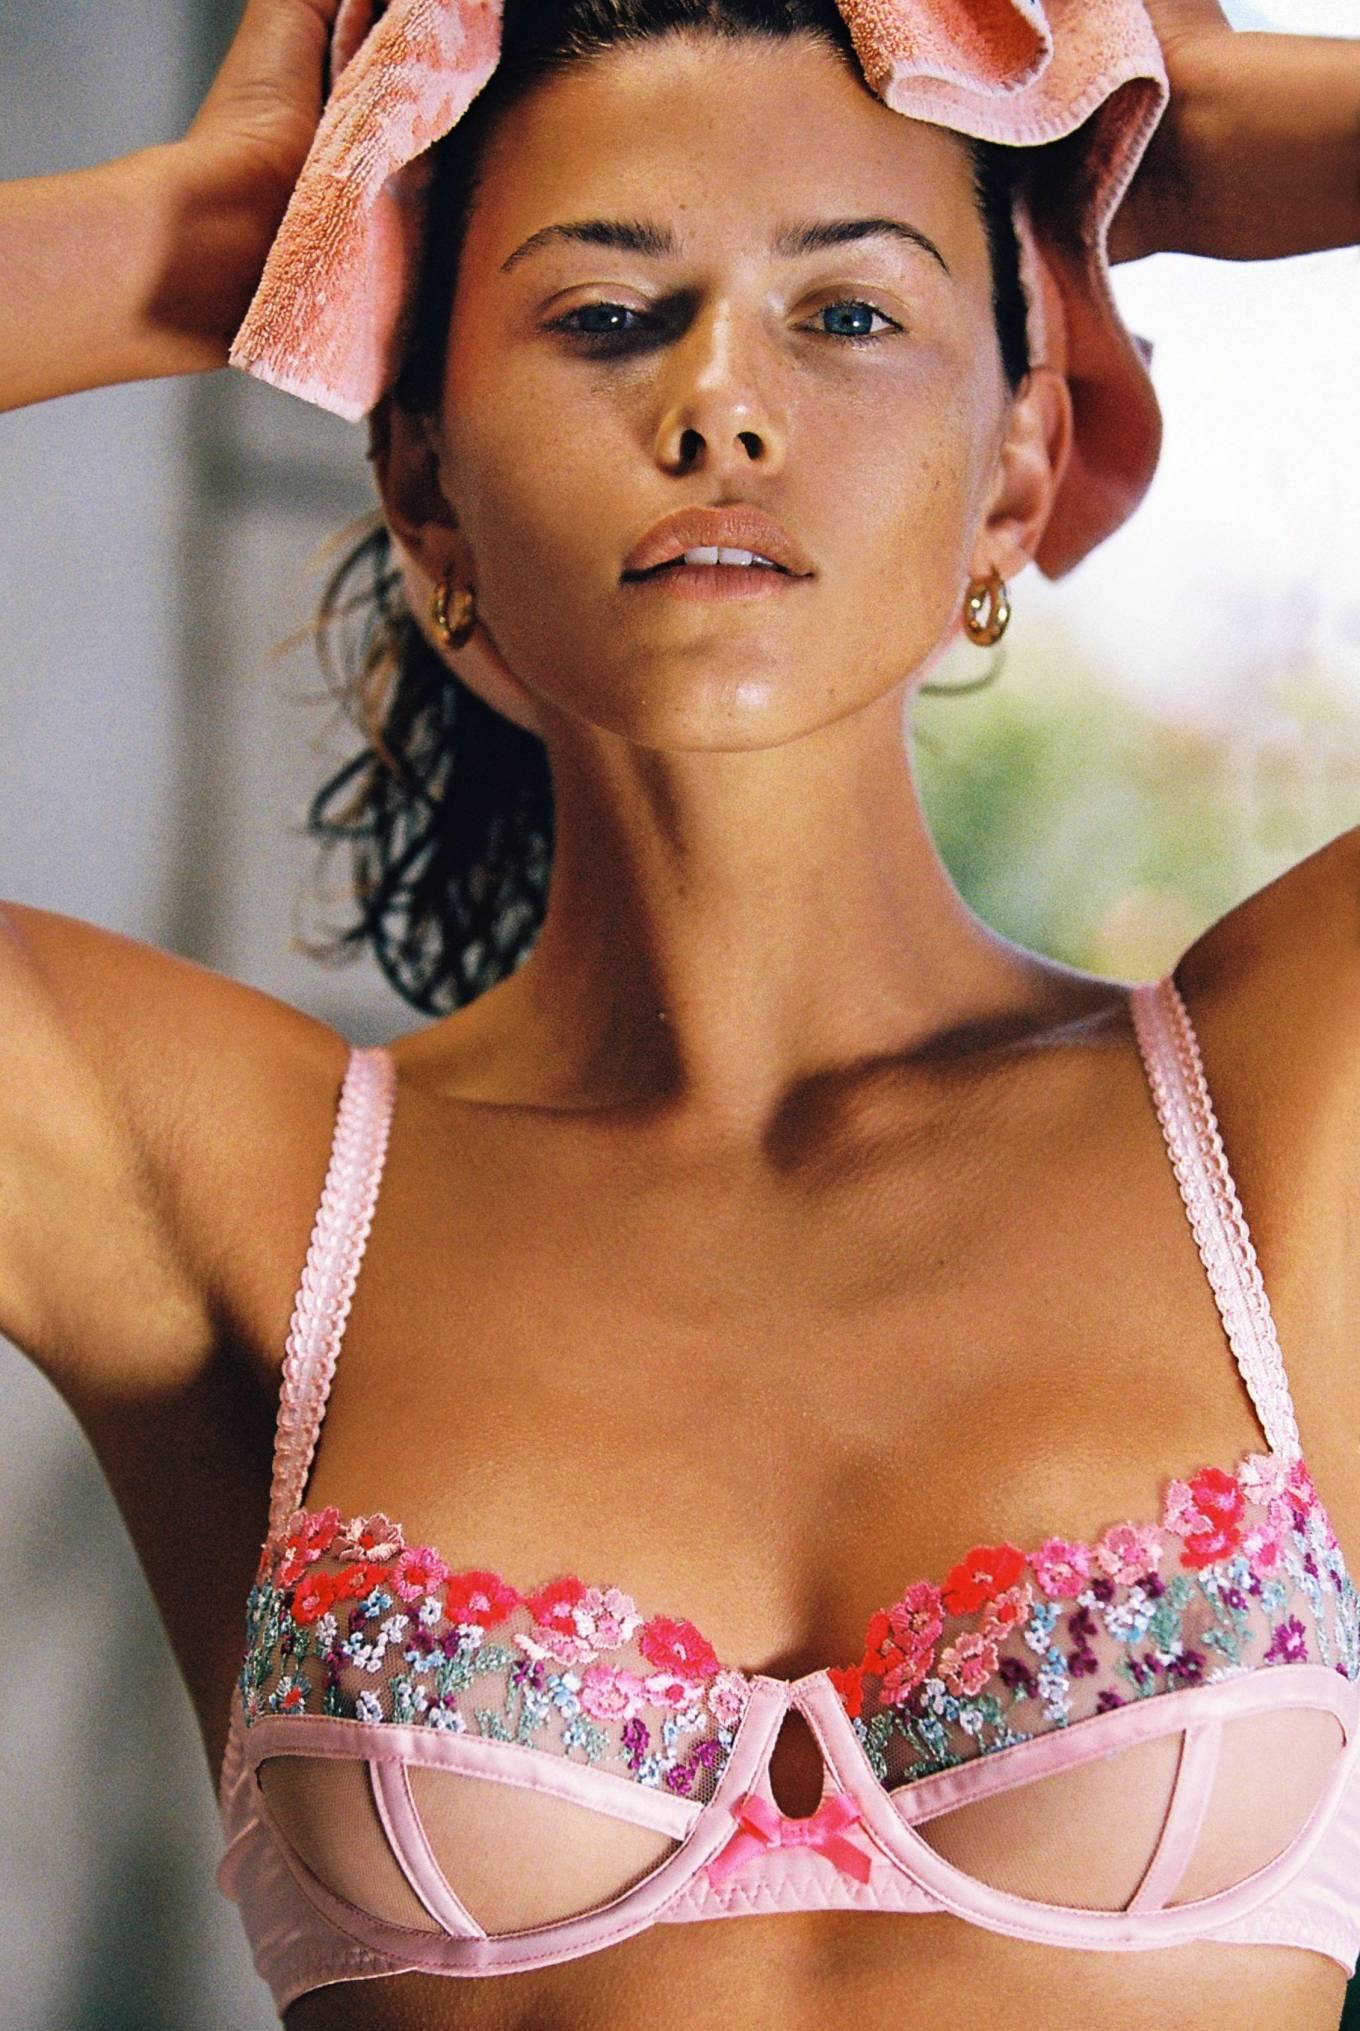 Georgia Fowler 2021 : Georgia Fowler – Victoria's Secret x For Love and Lemons (March 2021)-03